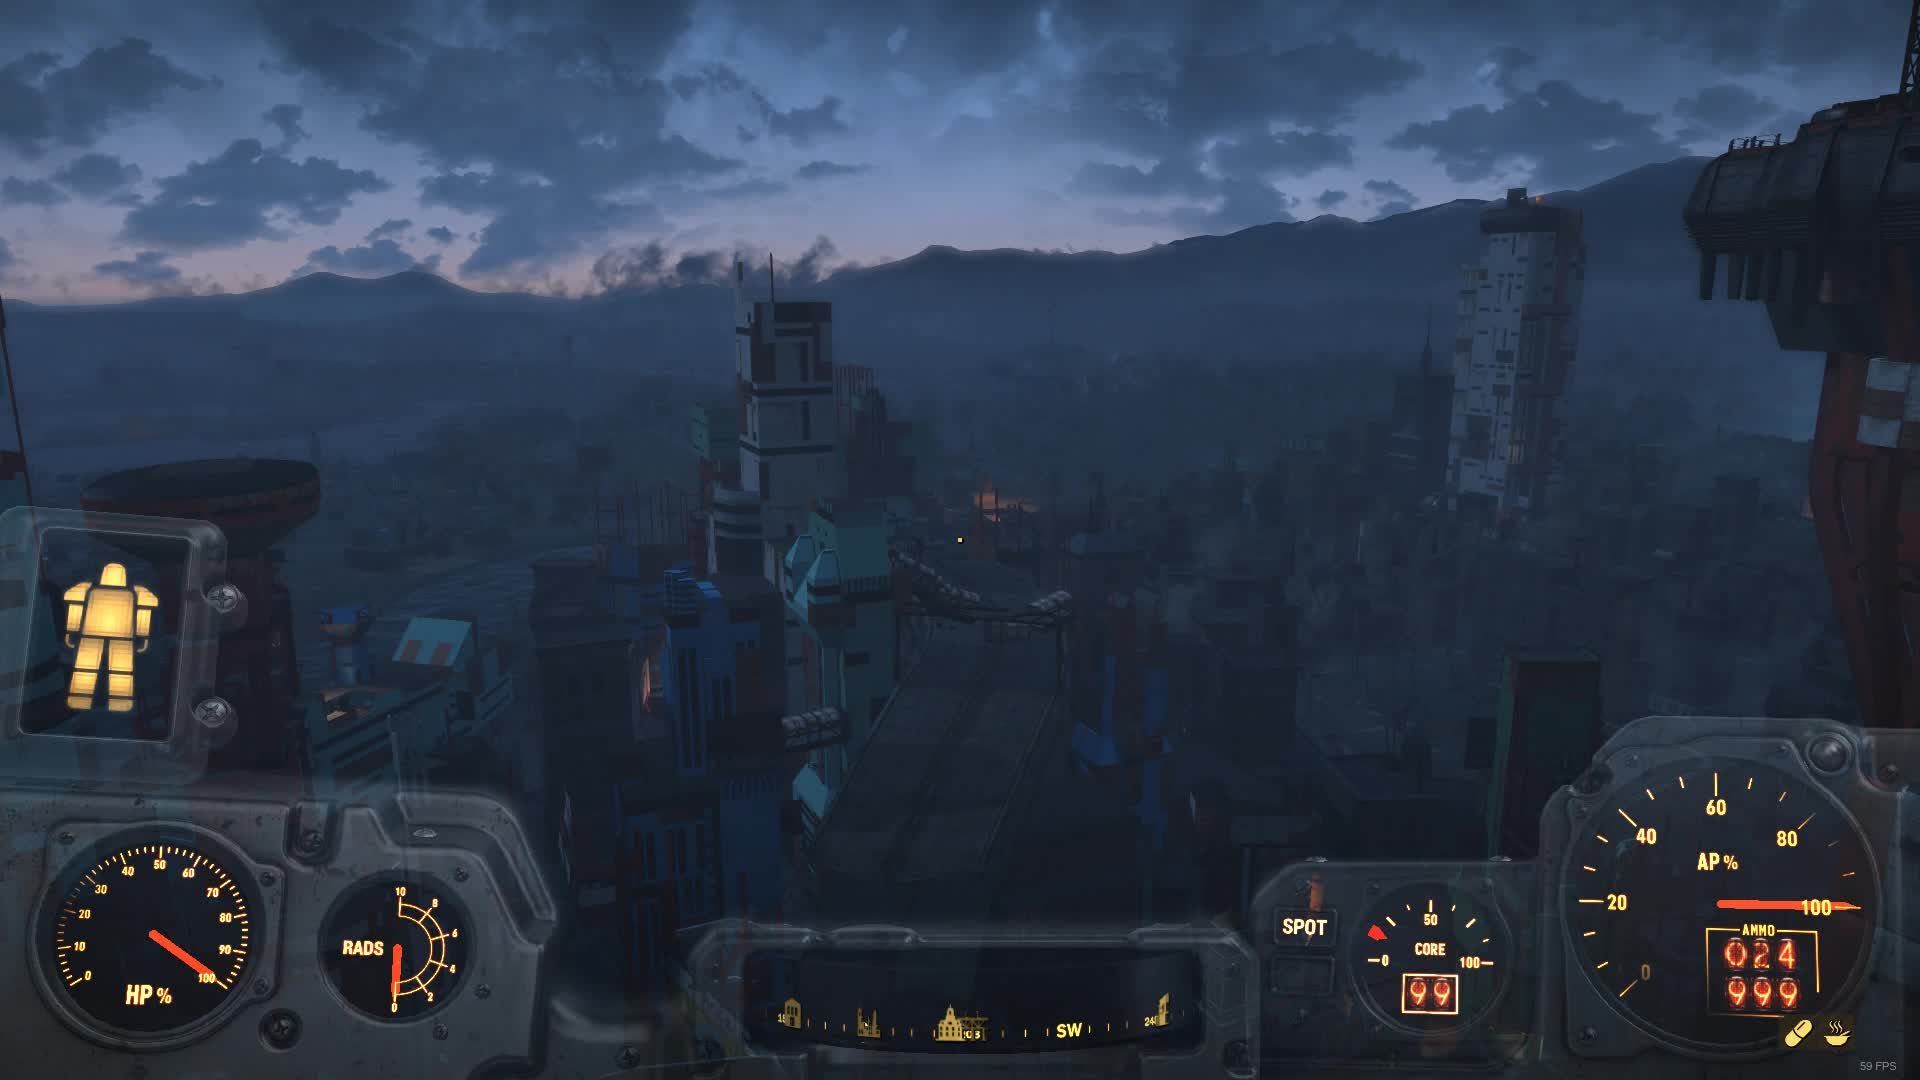 Fallout 4 04.17.2018 - 00.39.22.02 GIFs